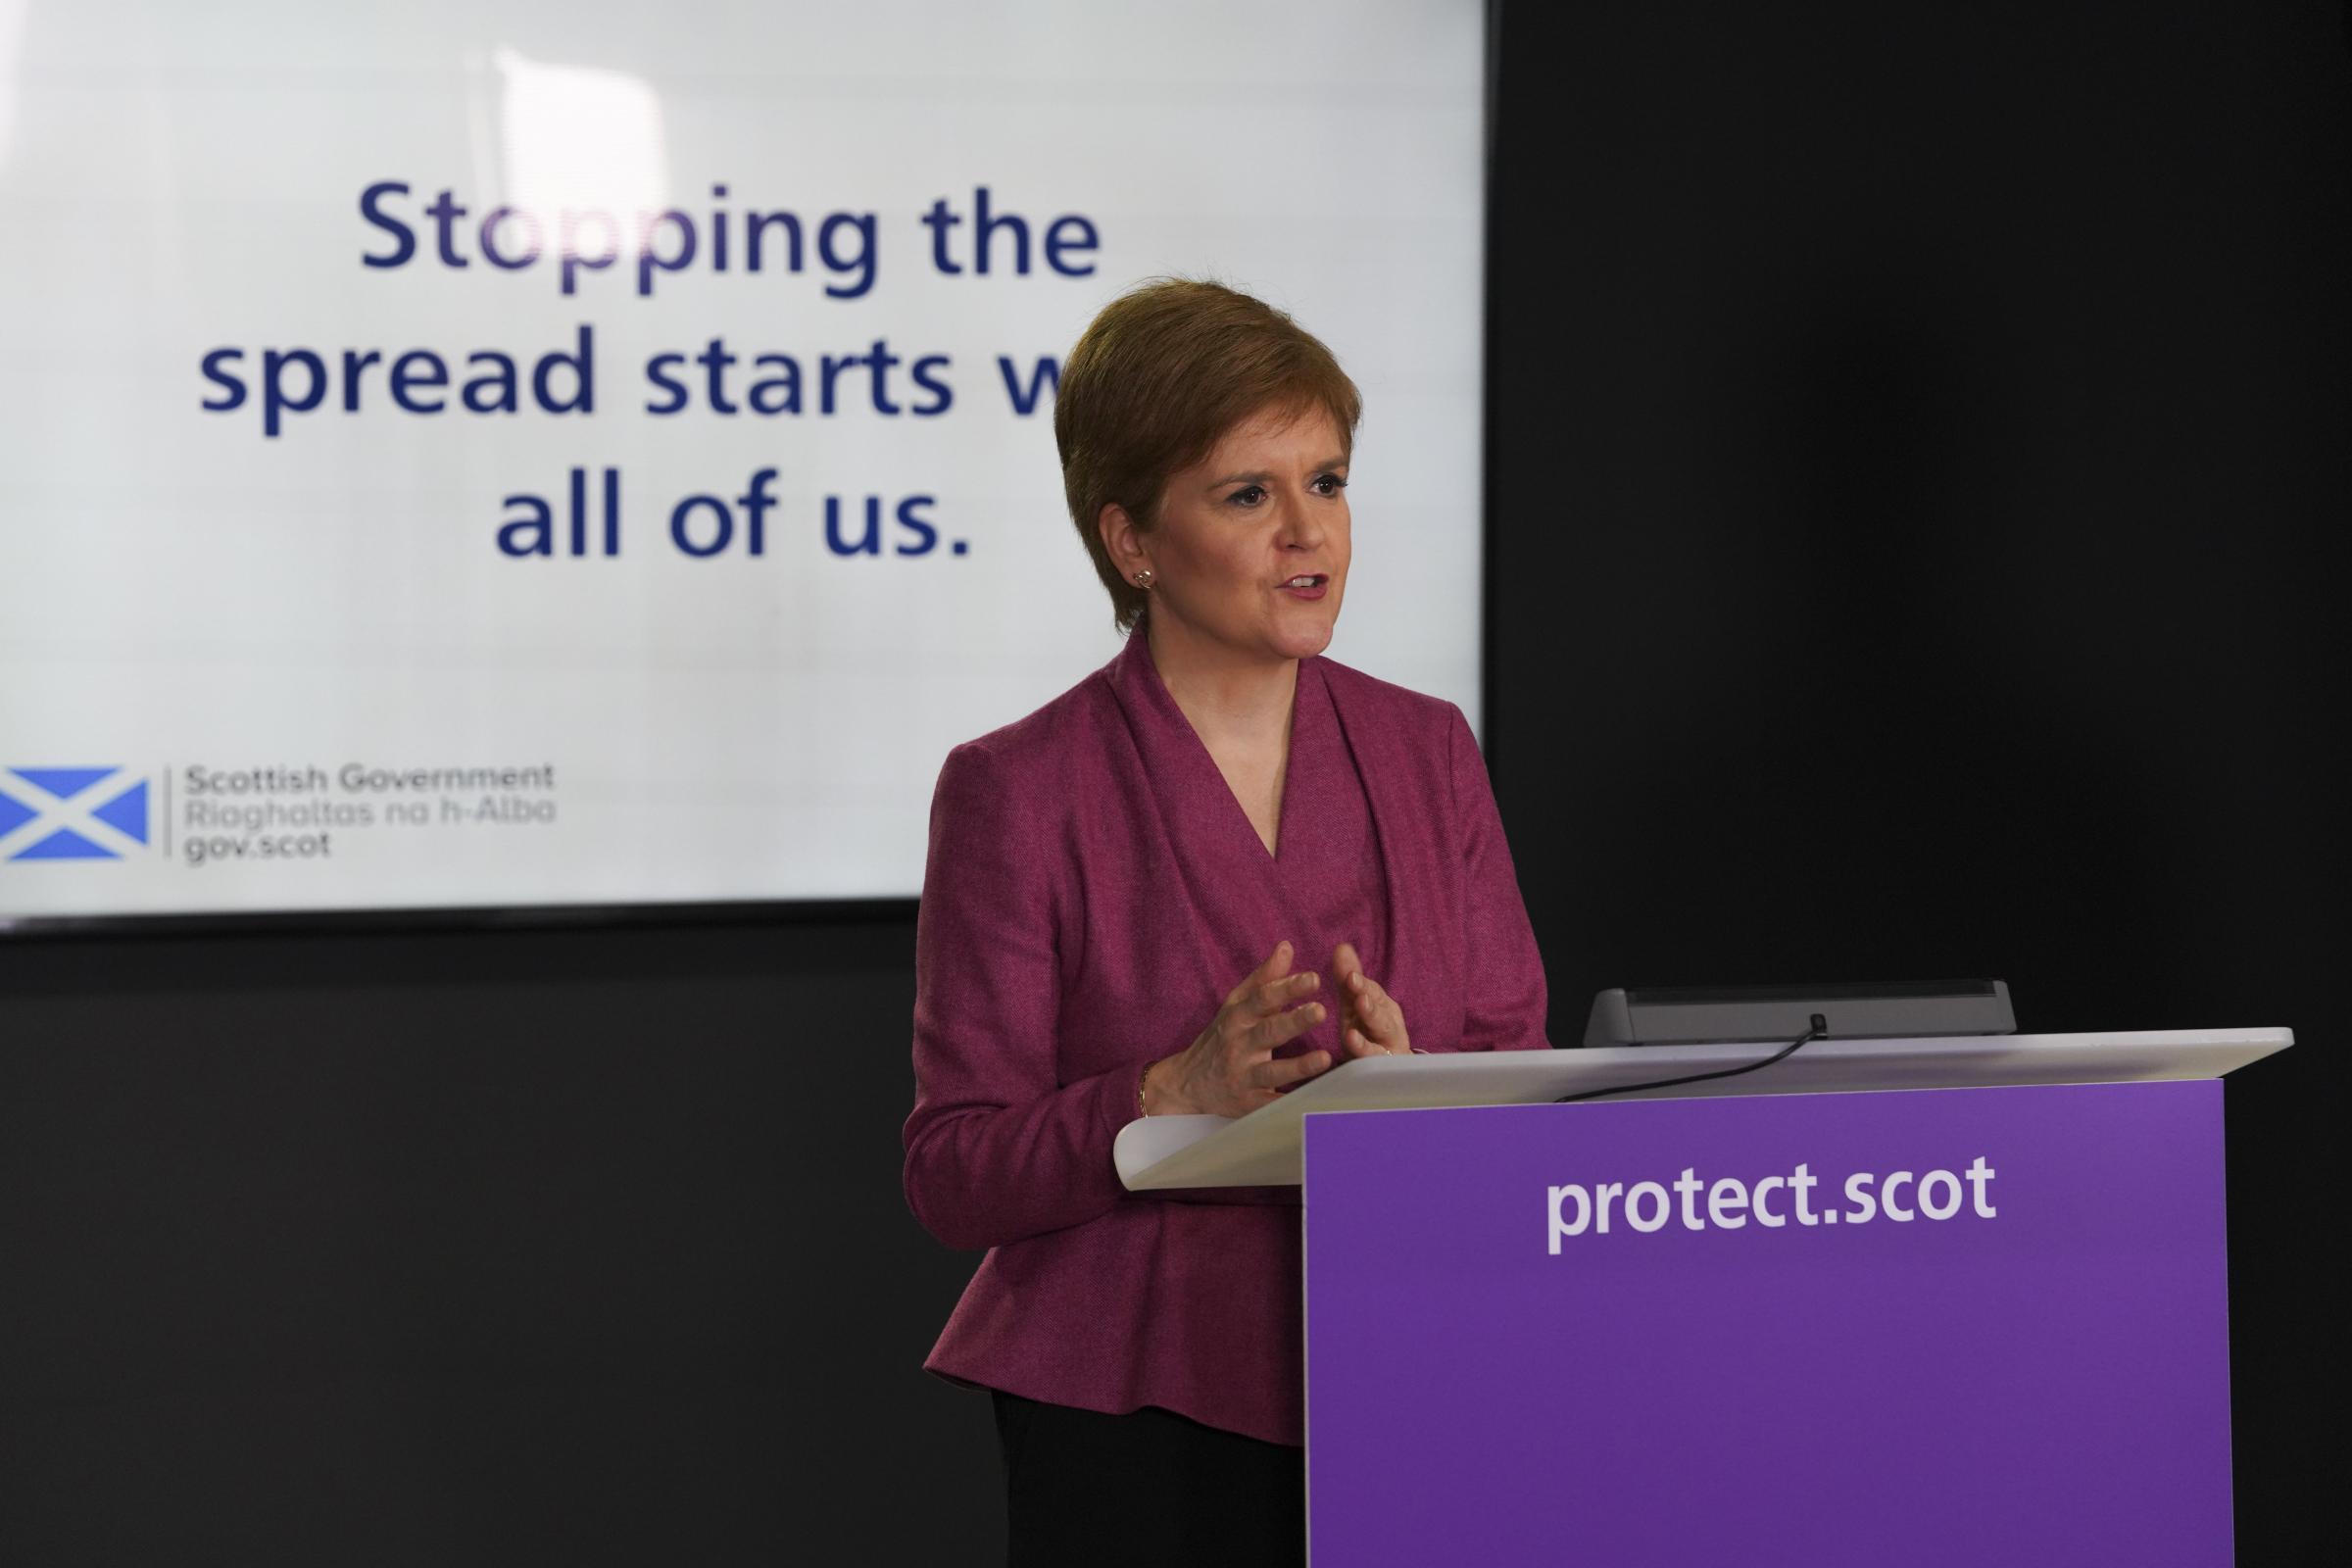 Scots to start receiving coronavirus vaccine next week, FM confirms